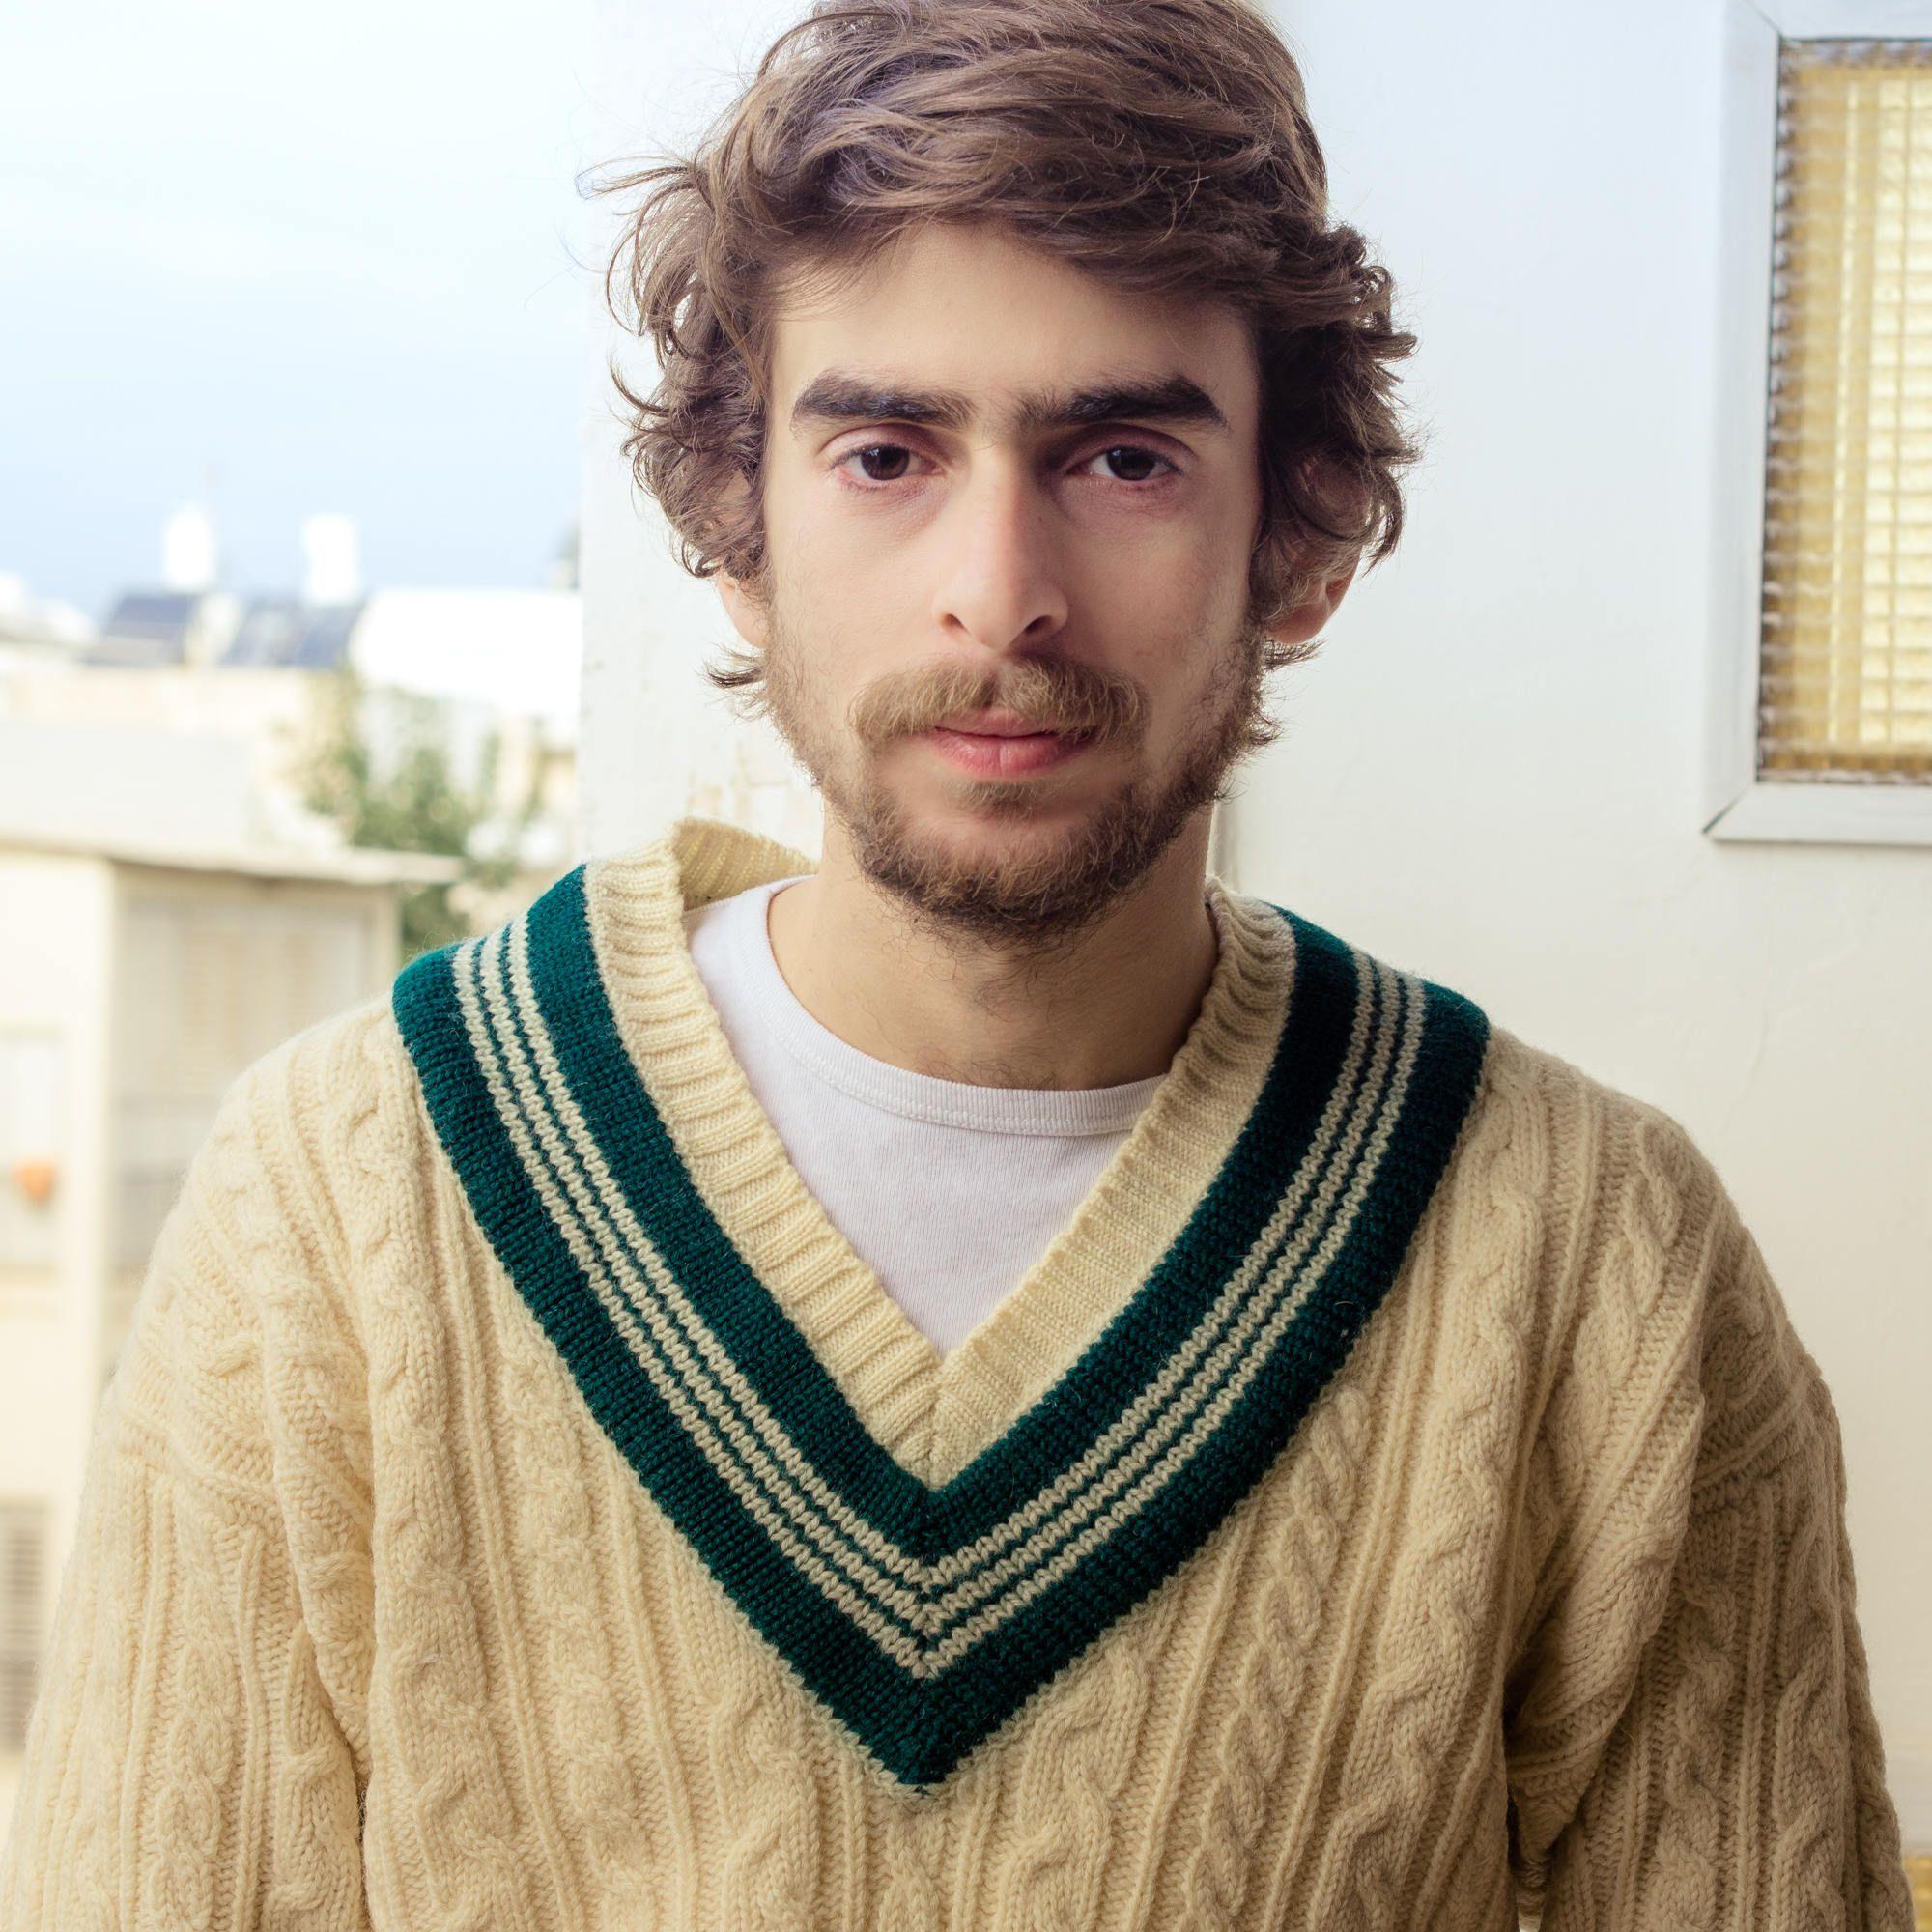 f0ec63596817fb Vintage Knitted Men Sweater, Cream Cable Knit V Neck Cricket Sweater, Green  Trim V, Size M / L Preppy, Wool Pullover Frat Boy 1990s